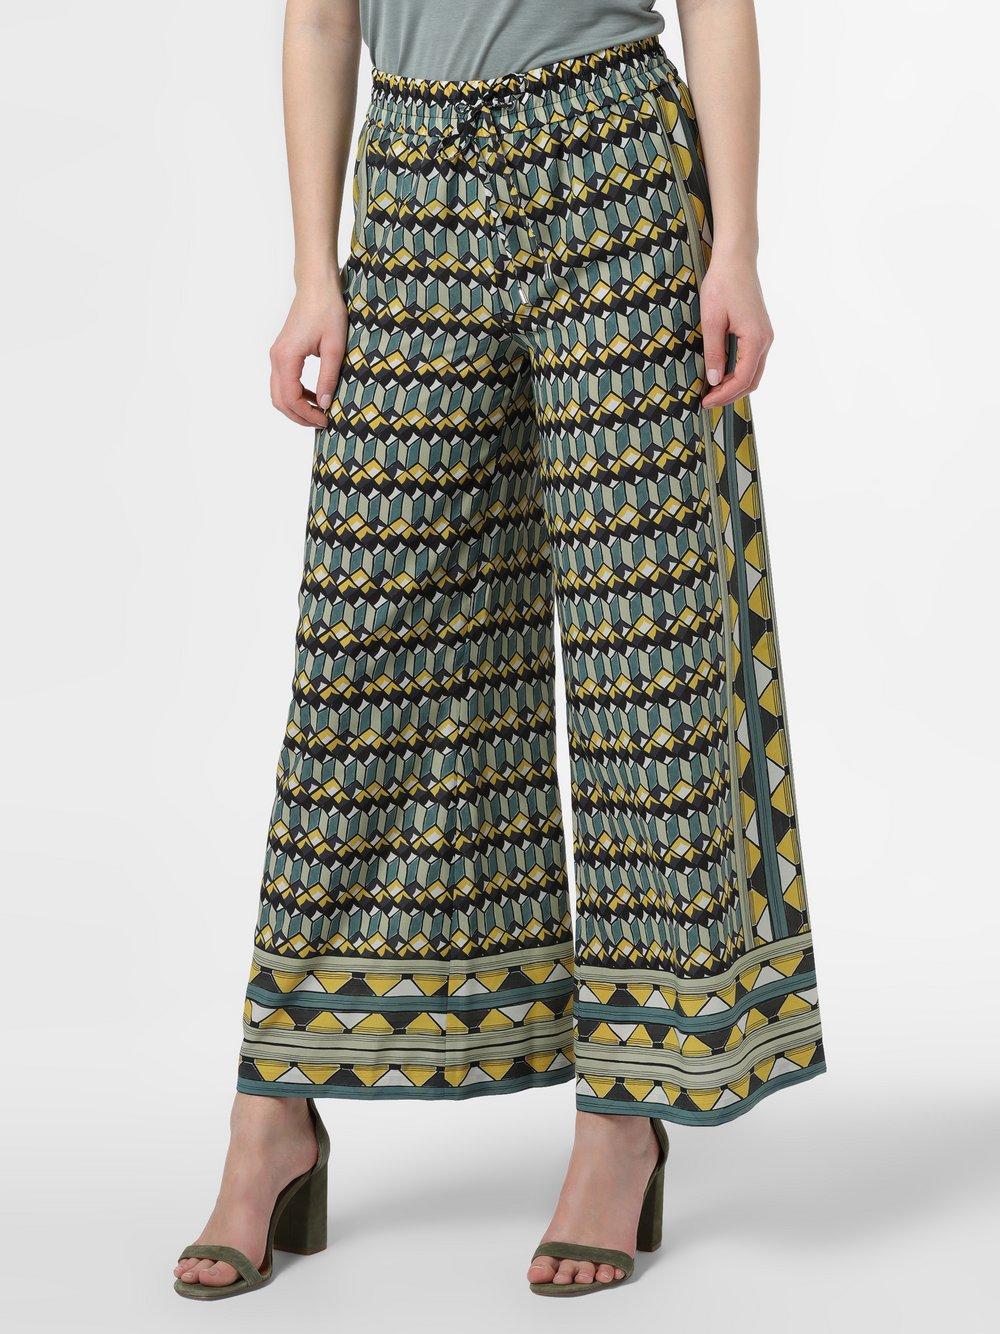 RAFFAELLO ROSSI – Spodnie damskie – Helena, zielony Van Graaf 466443-0001-00360